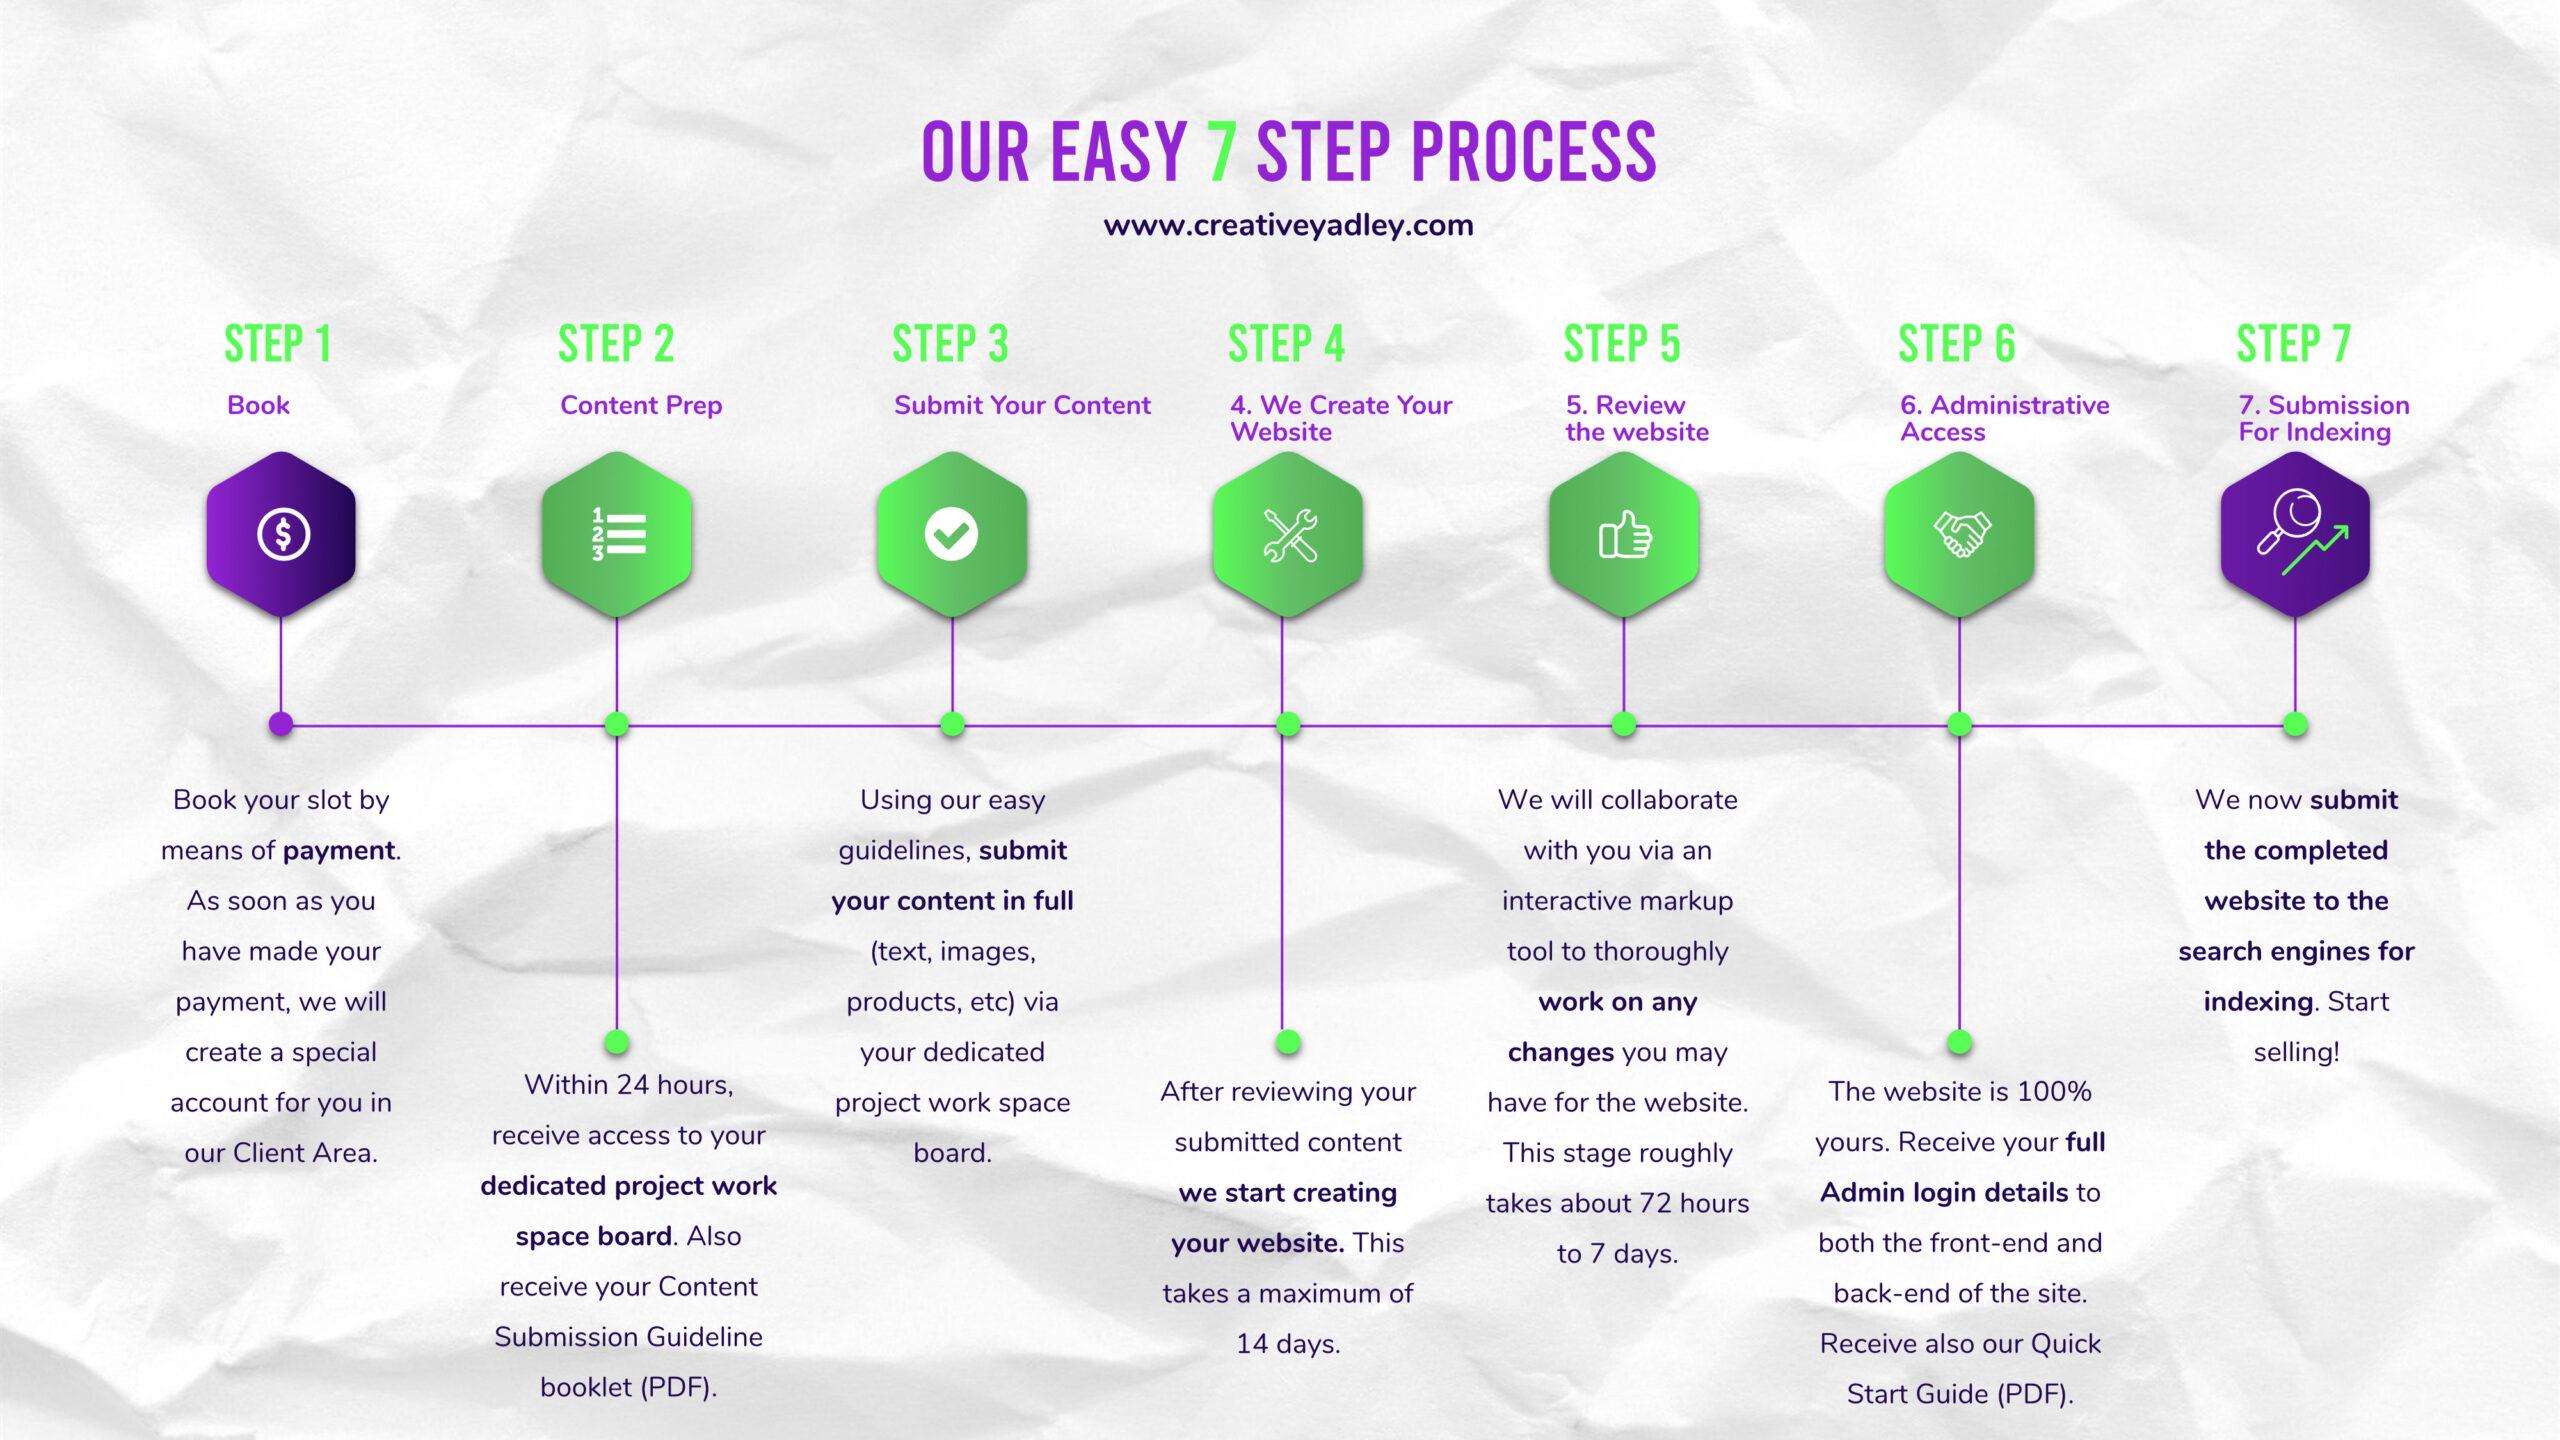 Creative Yadley - Custom Website Timeline